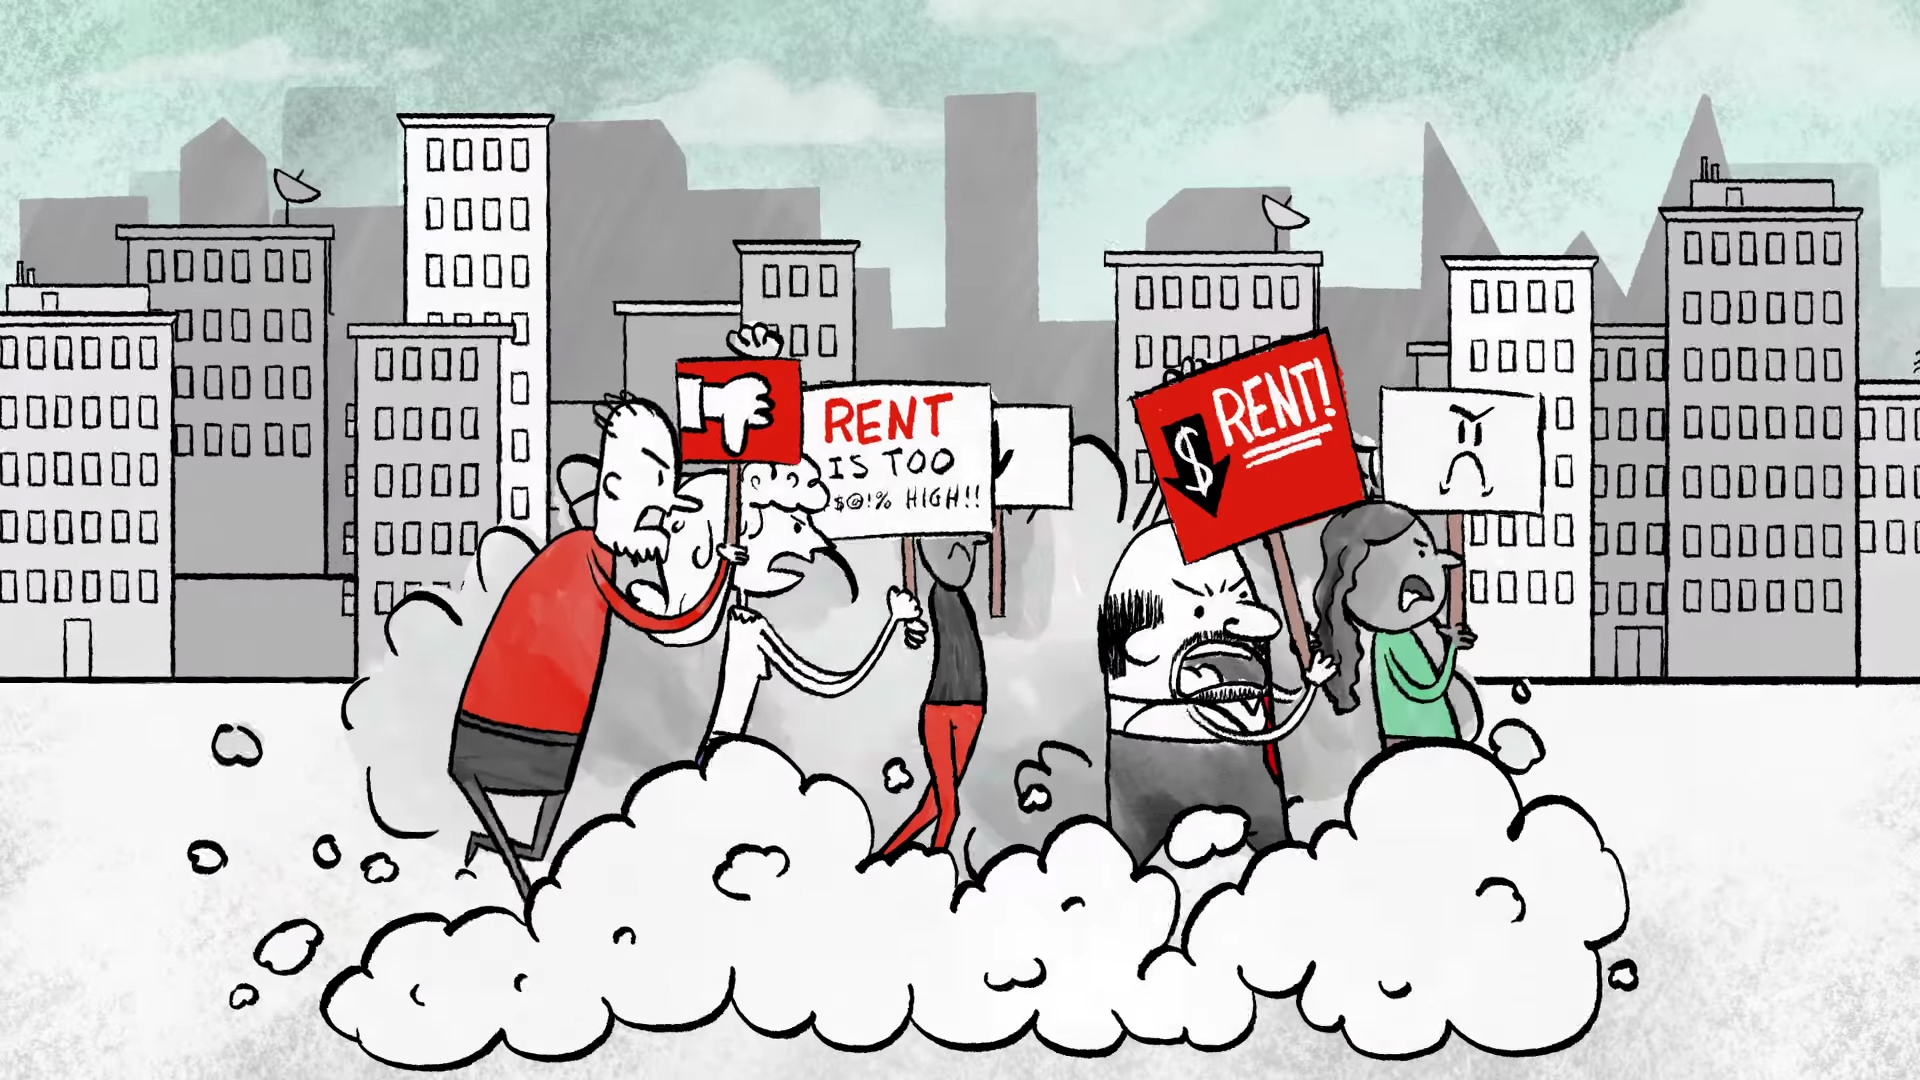 Rentcontrol protesters